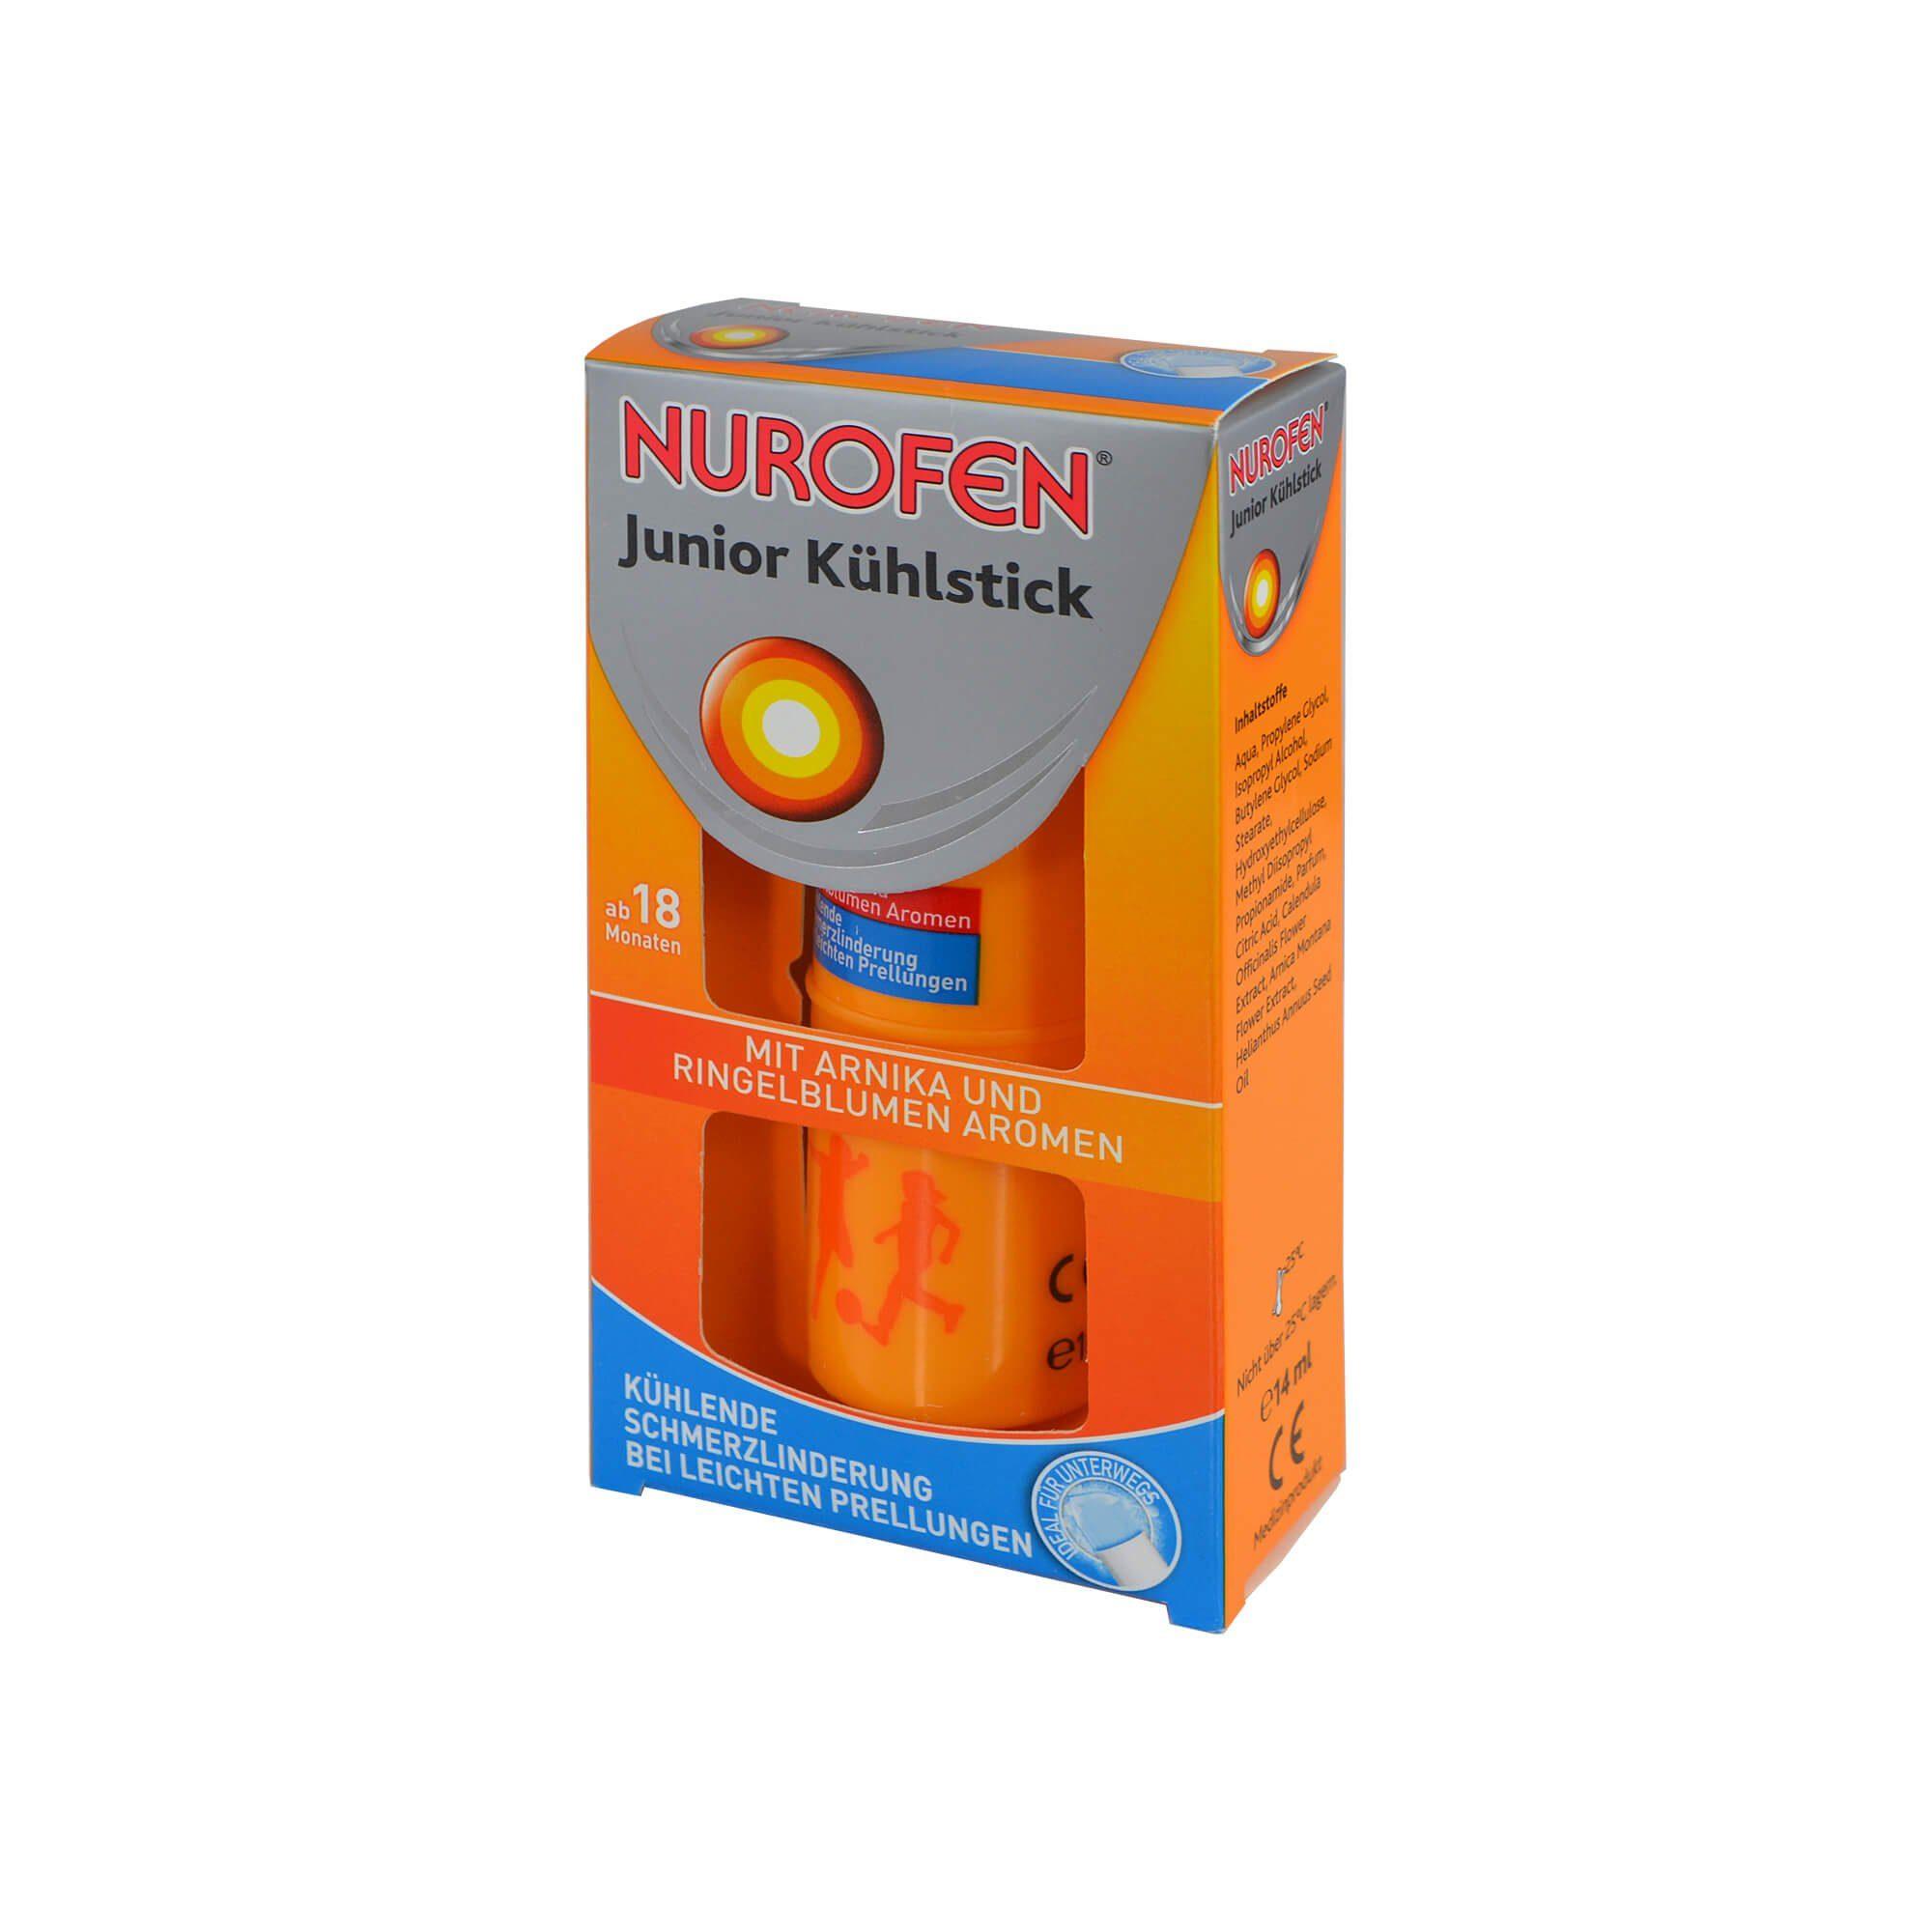 Nurofen Nurofen Junior Kühlstick , 14 ml